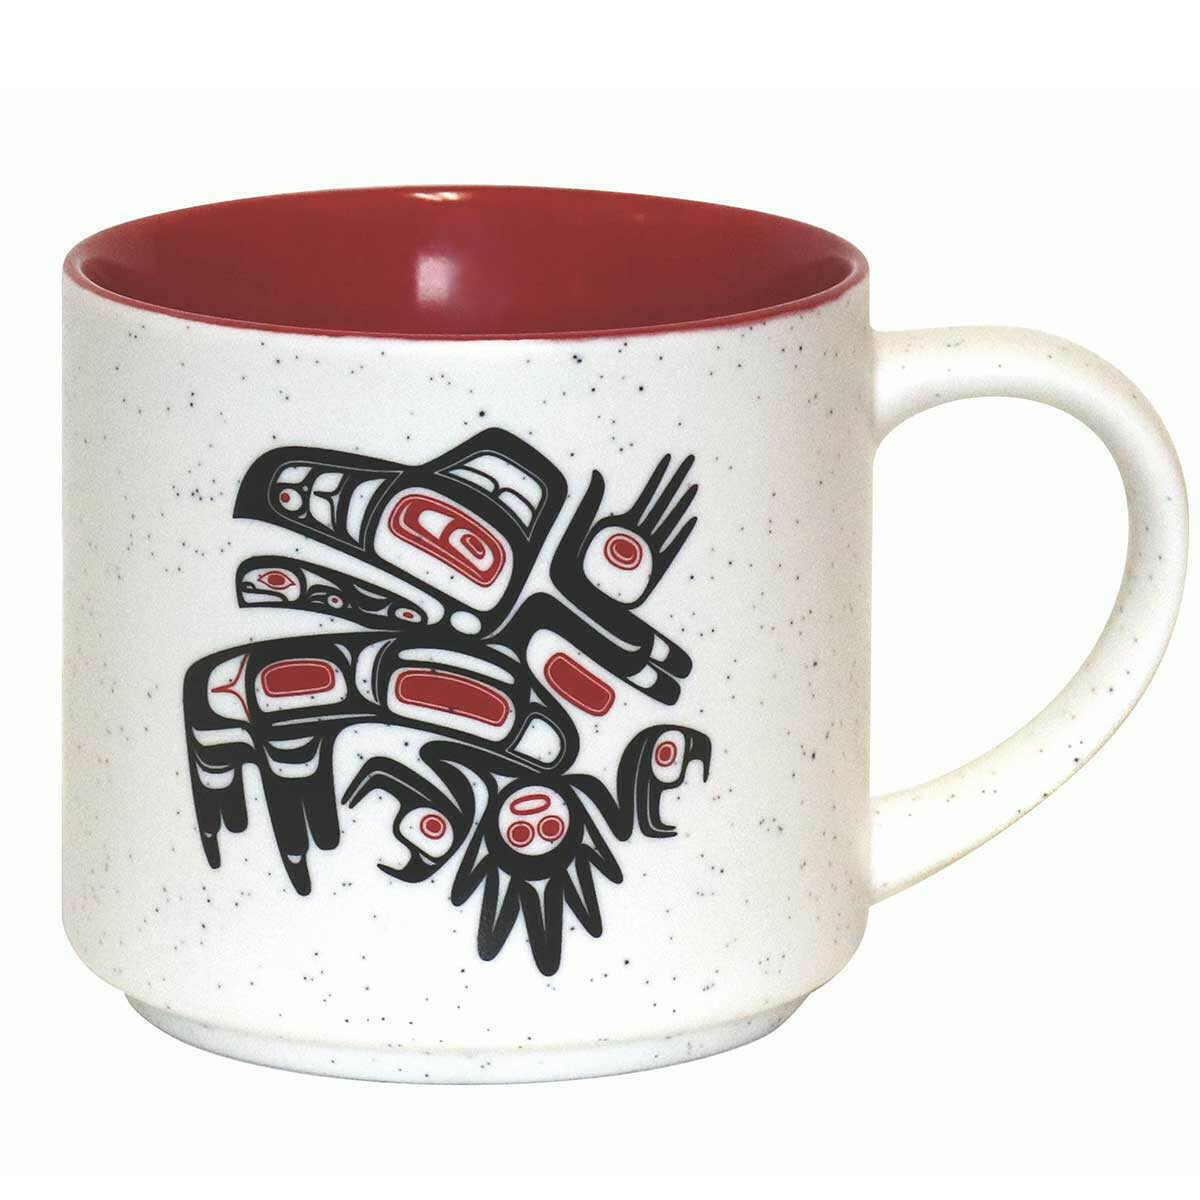 Ceramic Mug - Running Raven